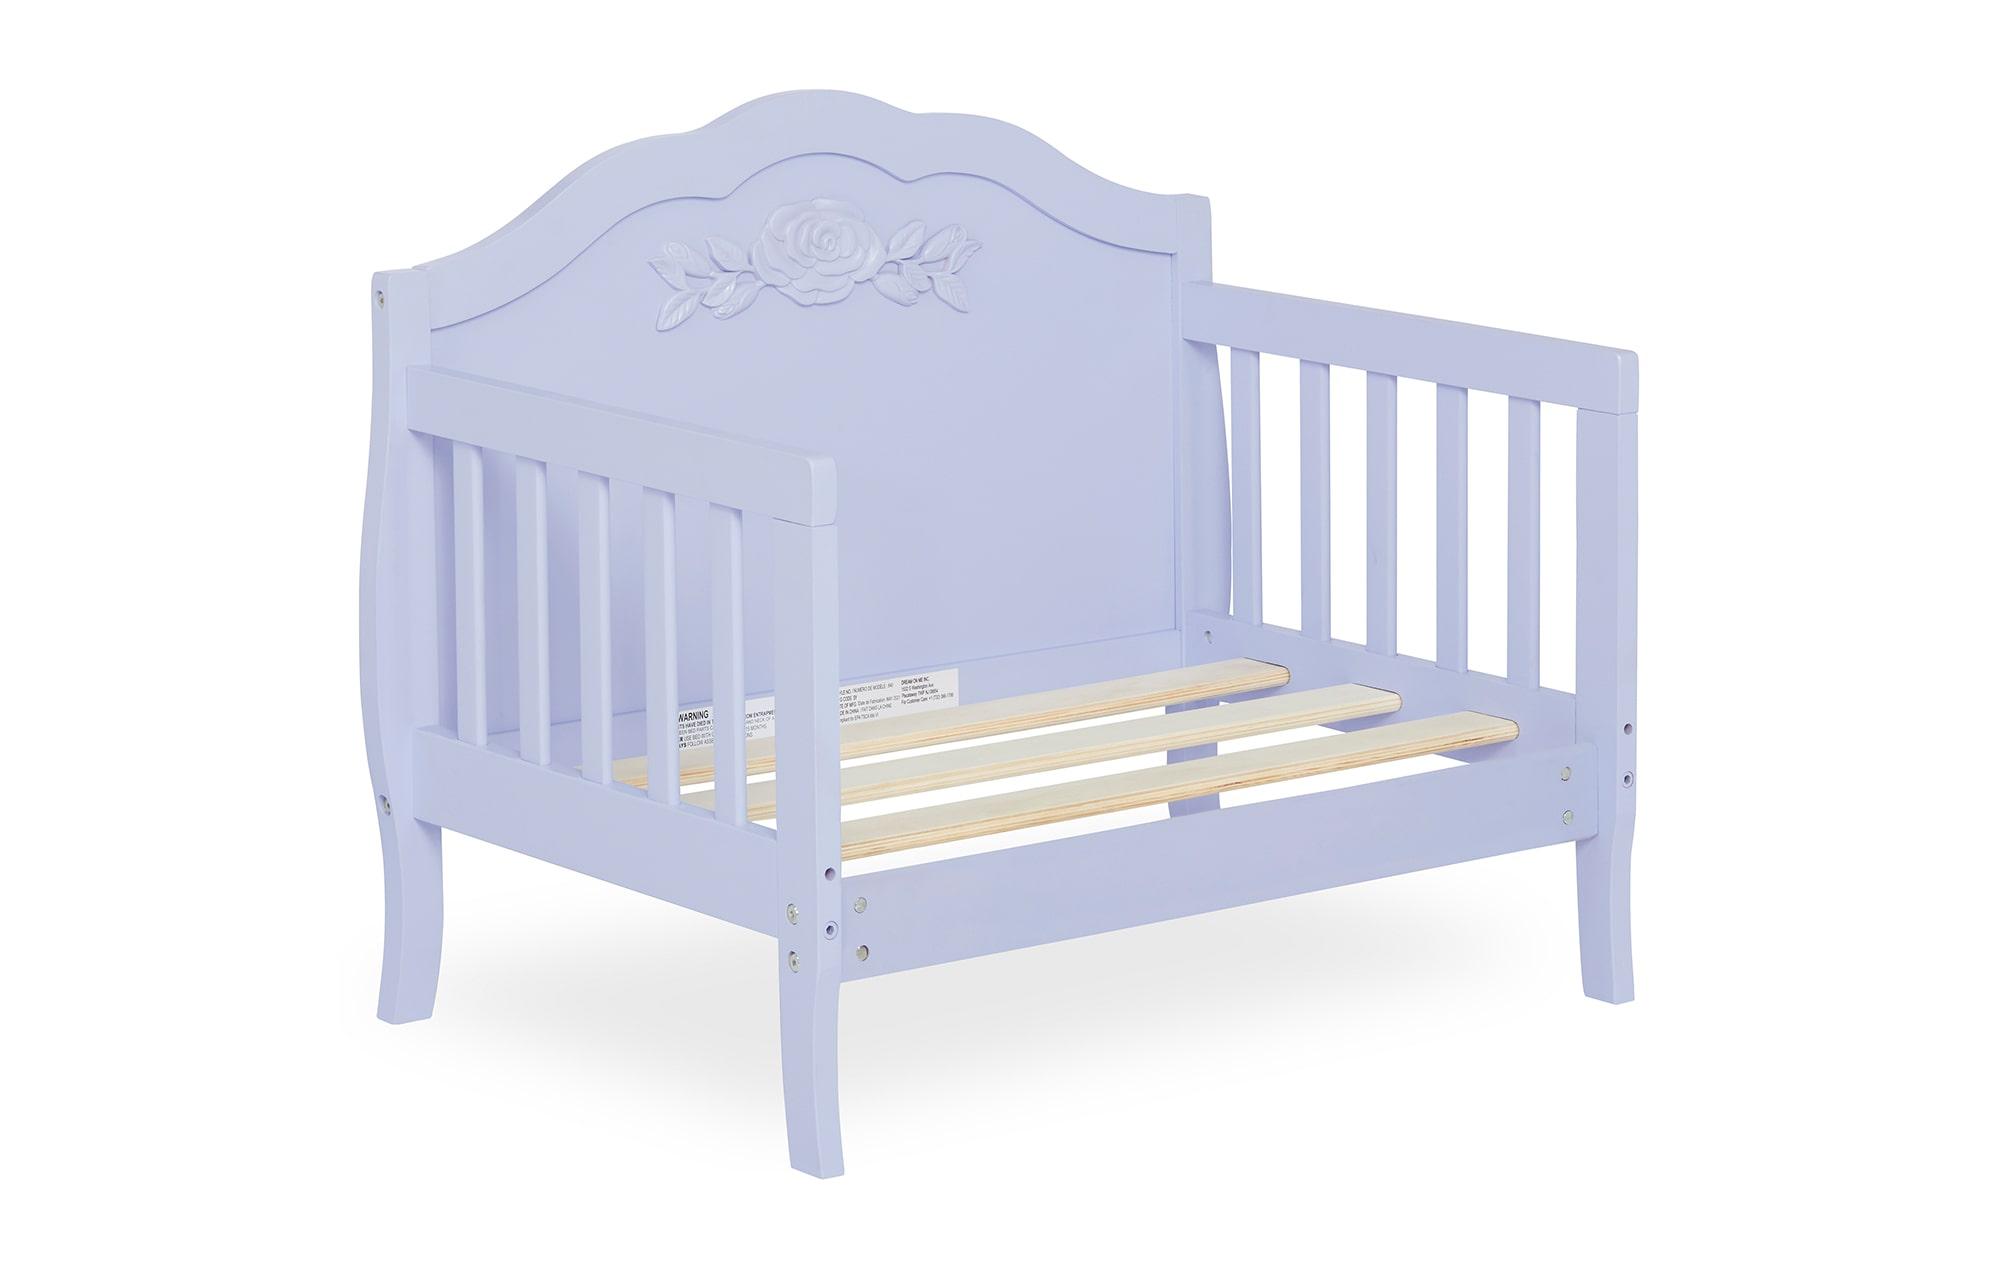 640_LAVD Rose Toddler Bed Silo 9